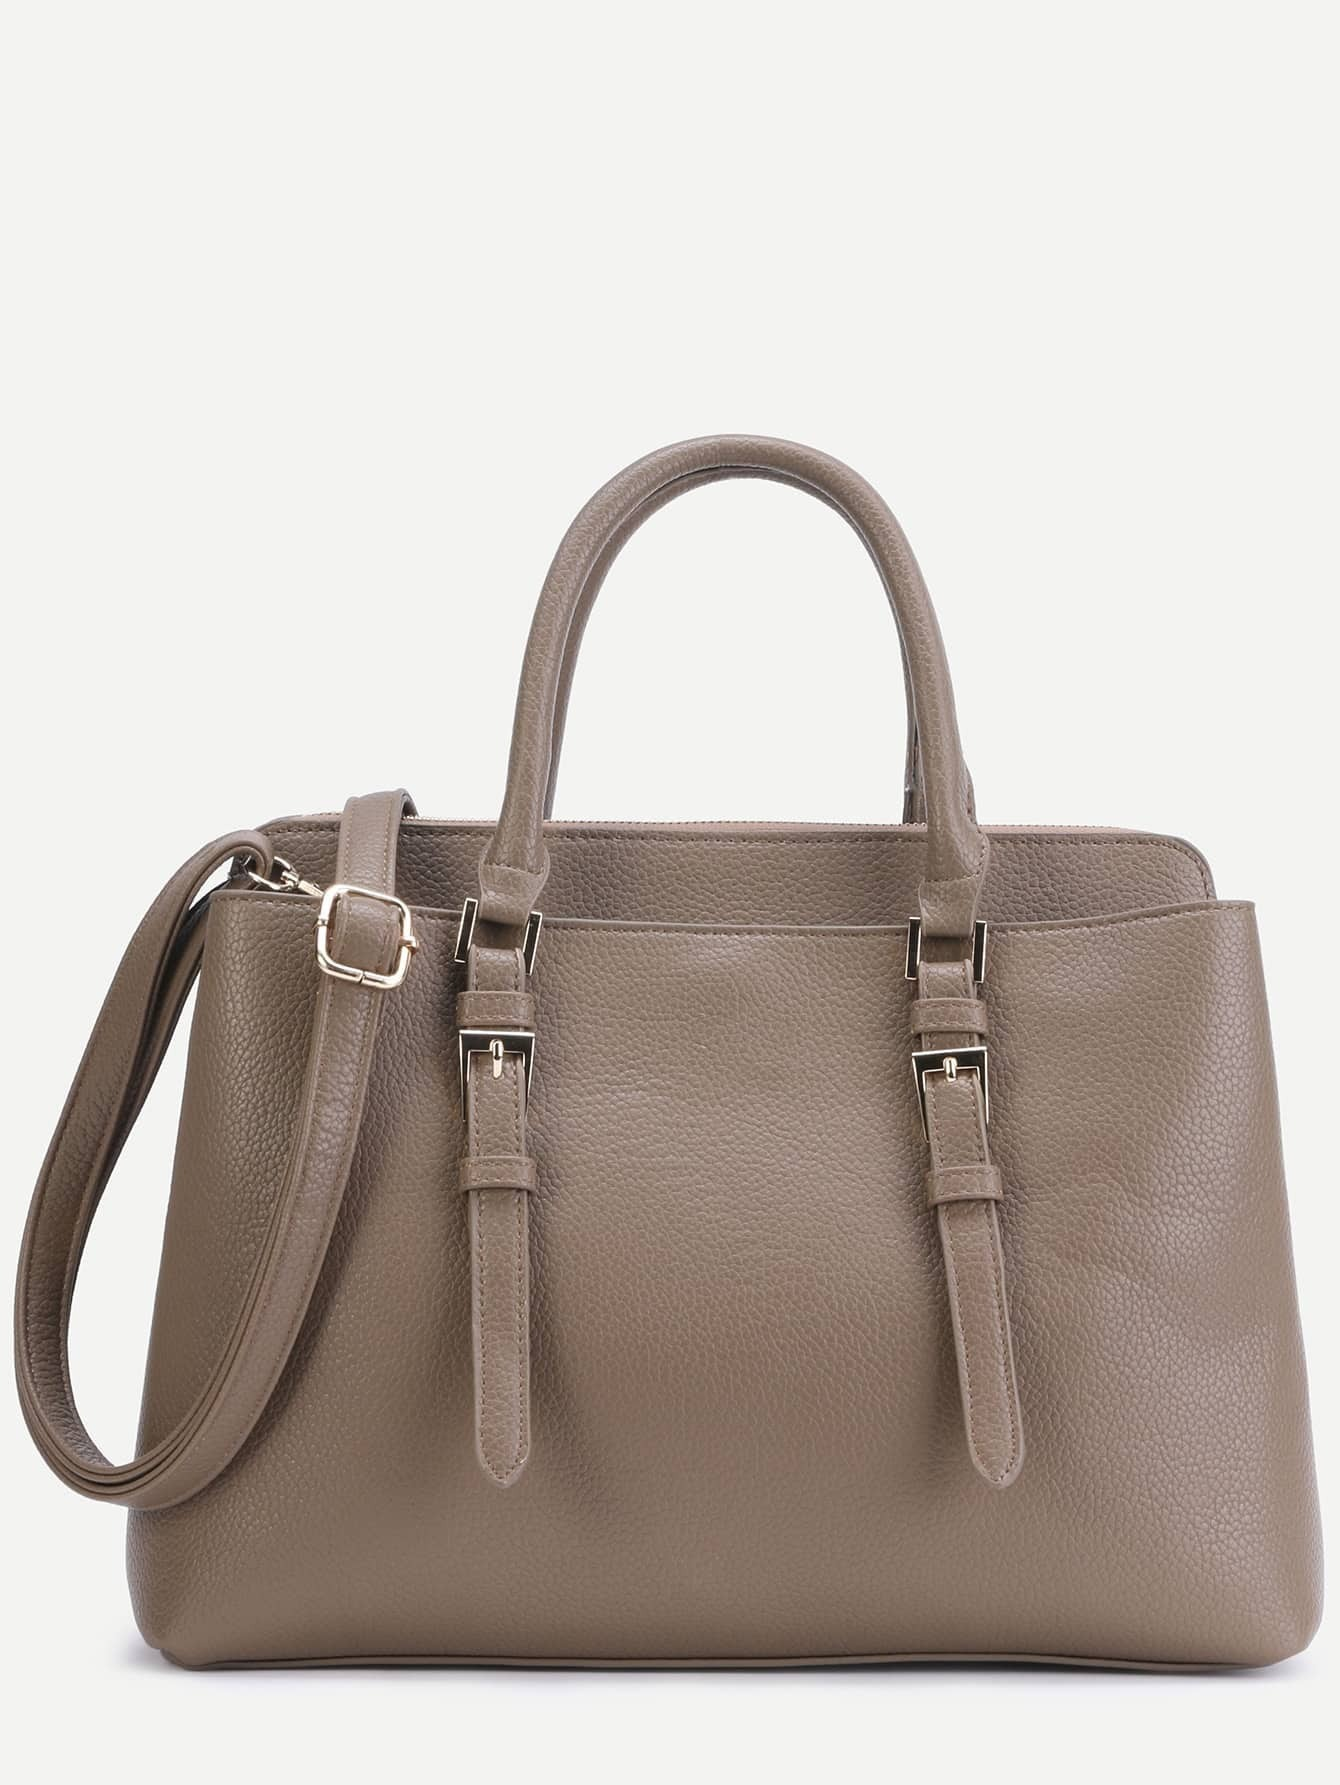 bag160926913_2